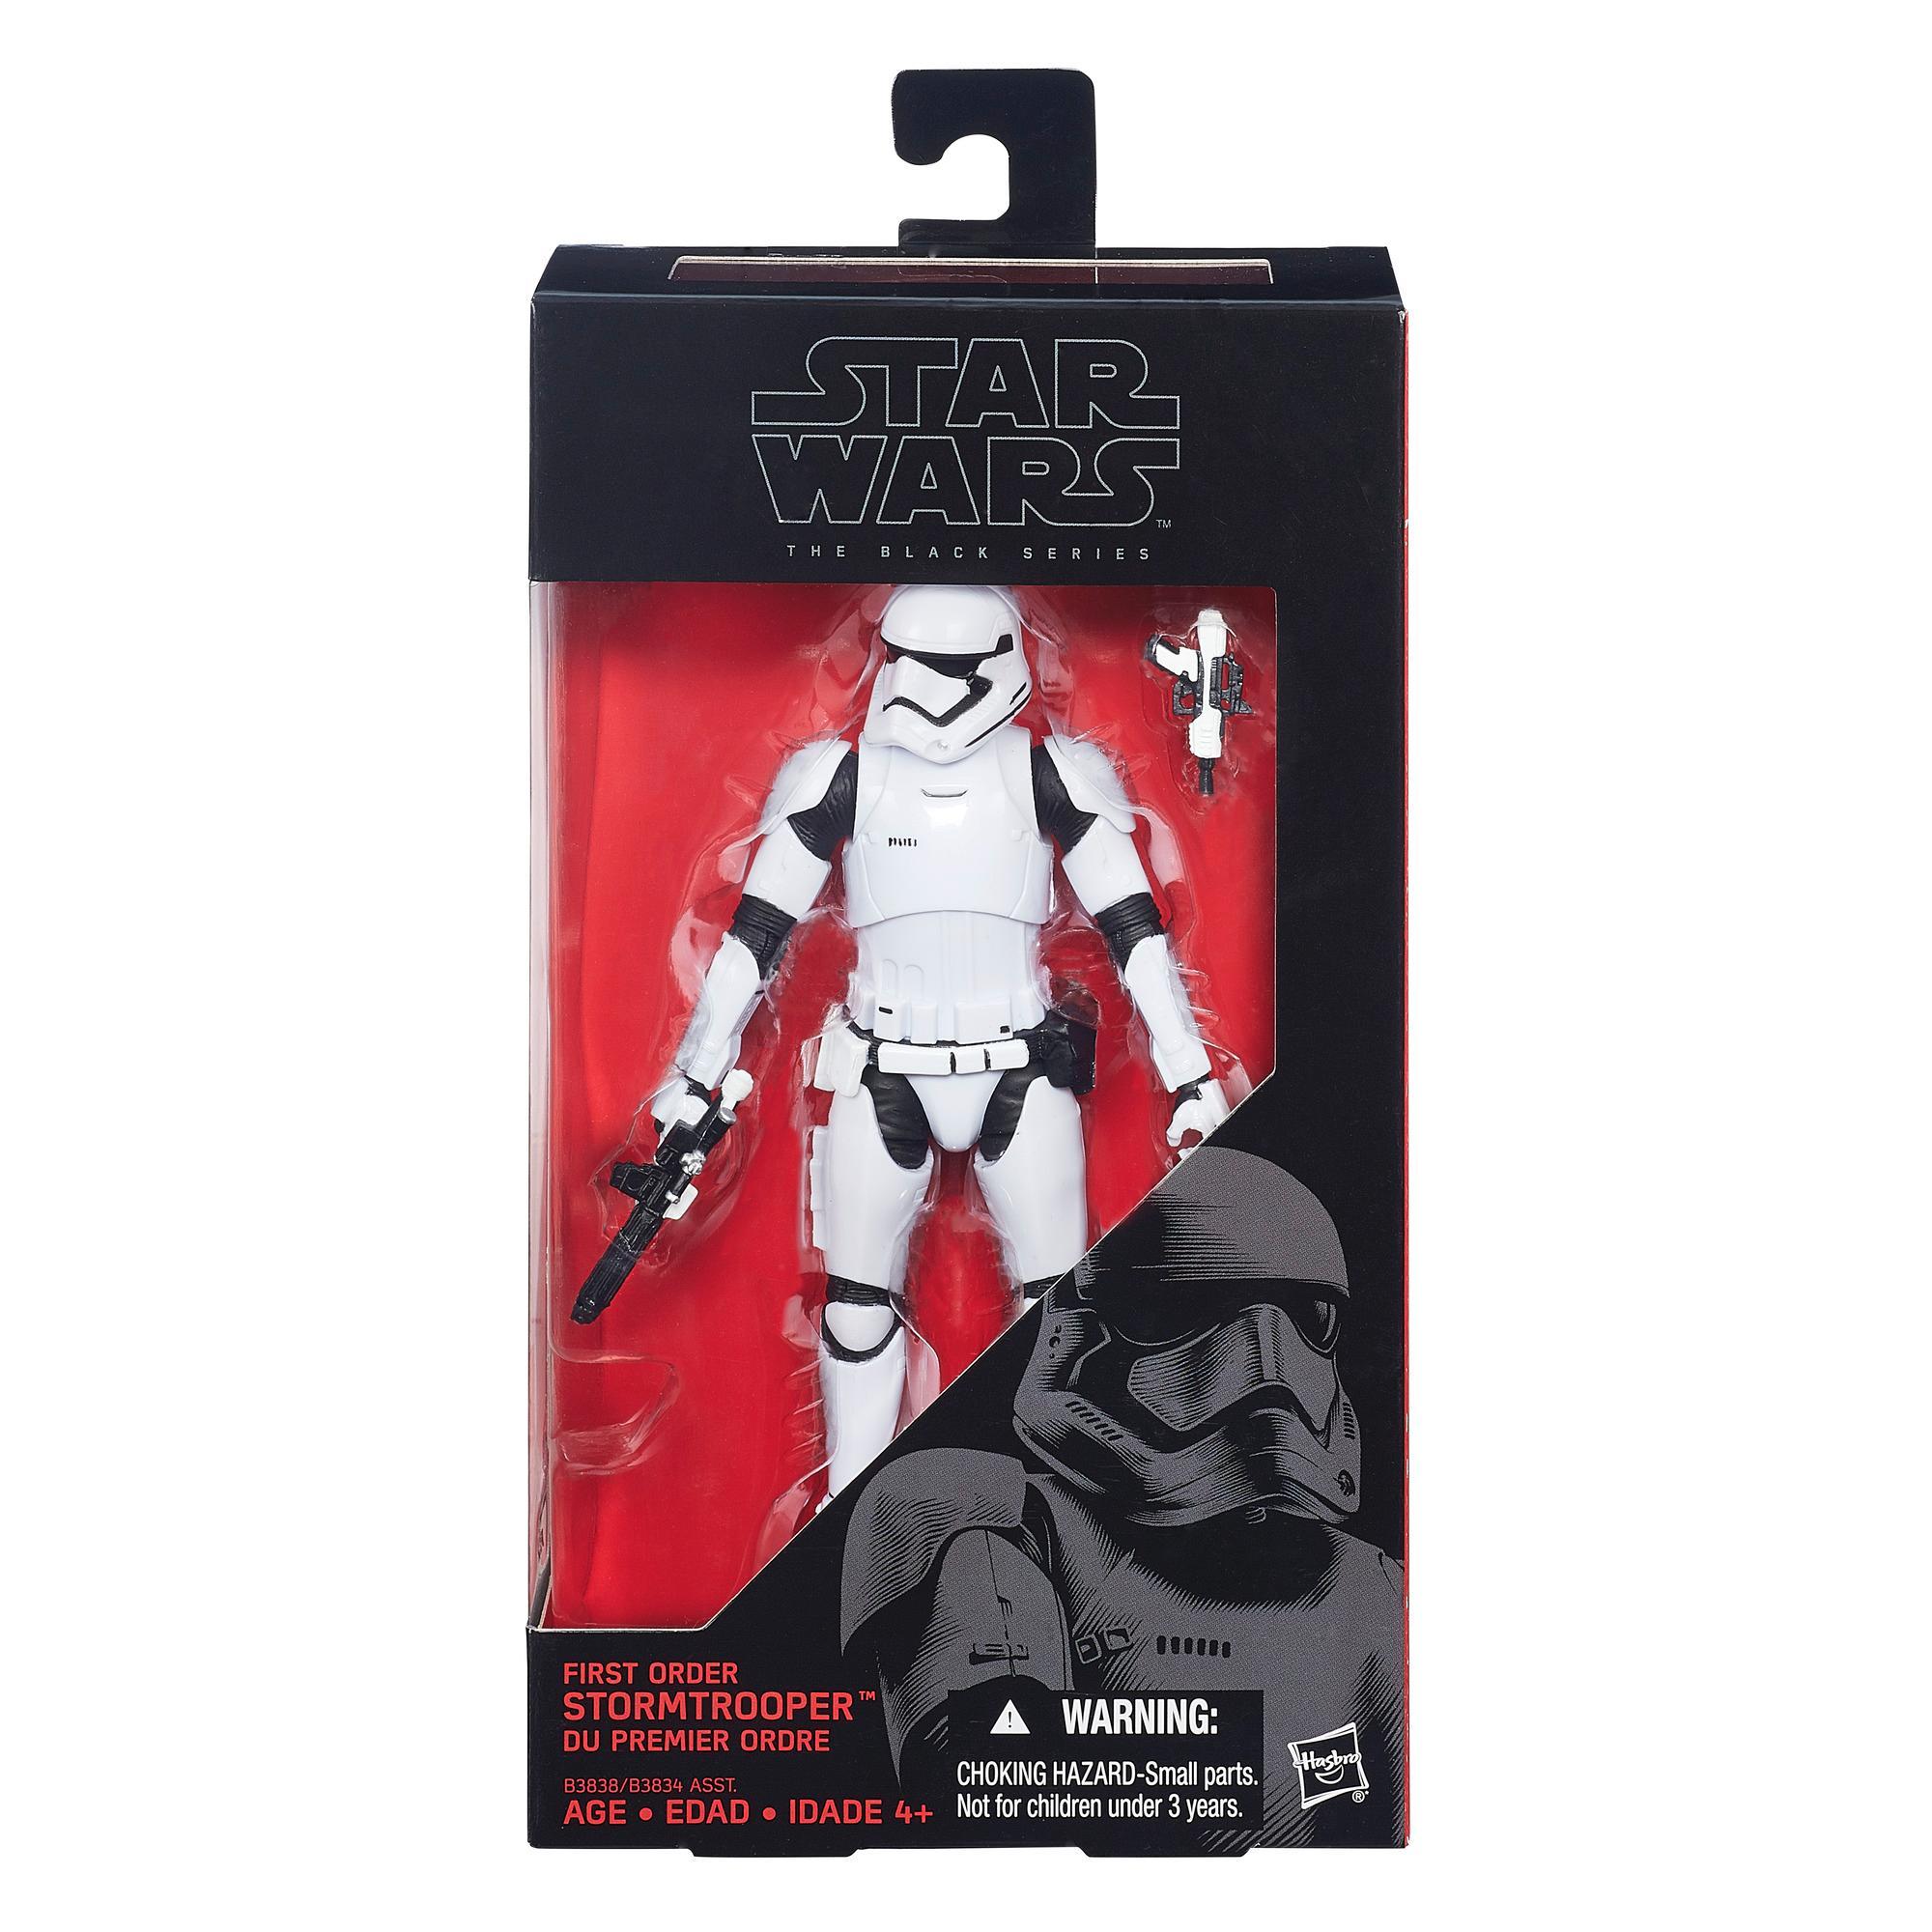 Star Wars – The Black Series – Stormtrooper da Primeira Ordem com 15,24 cm (6 pol.)